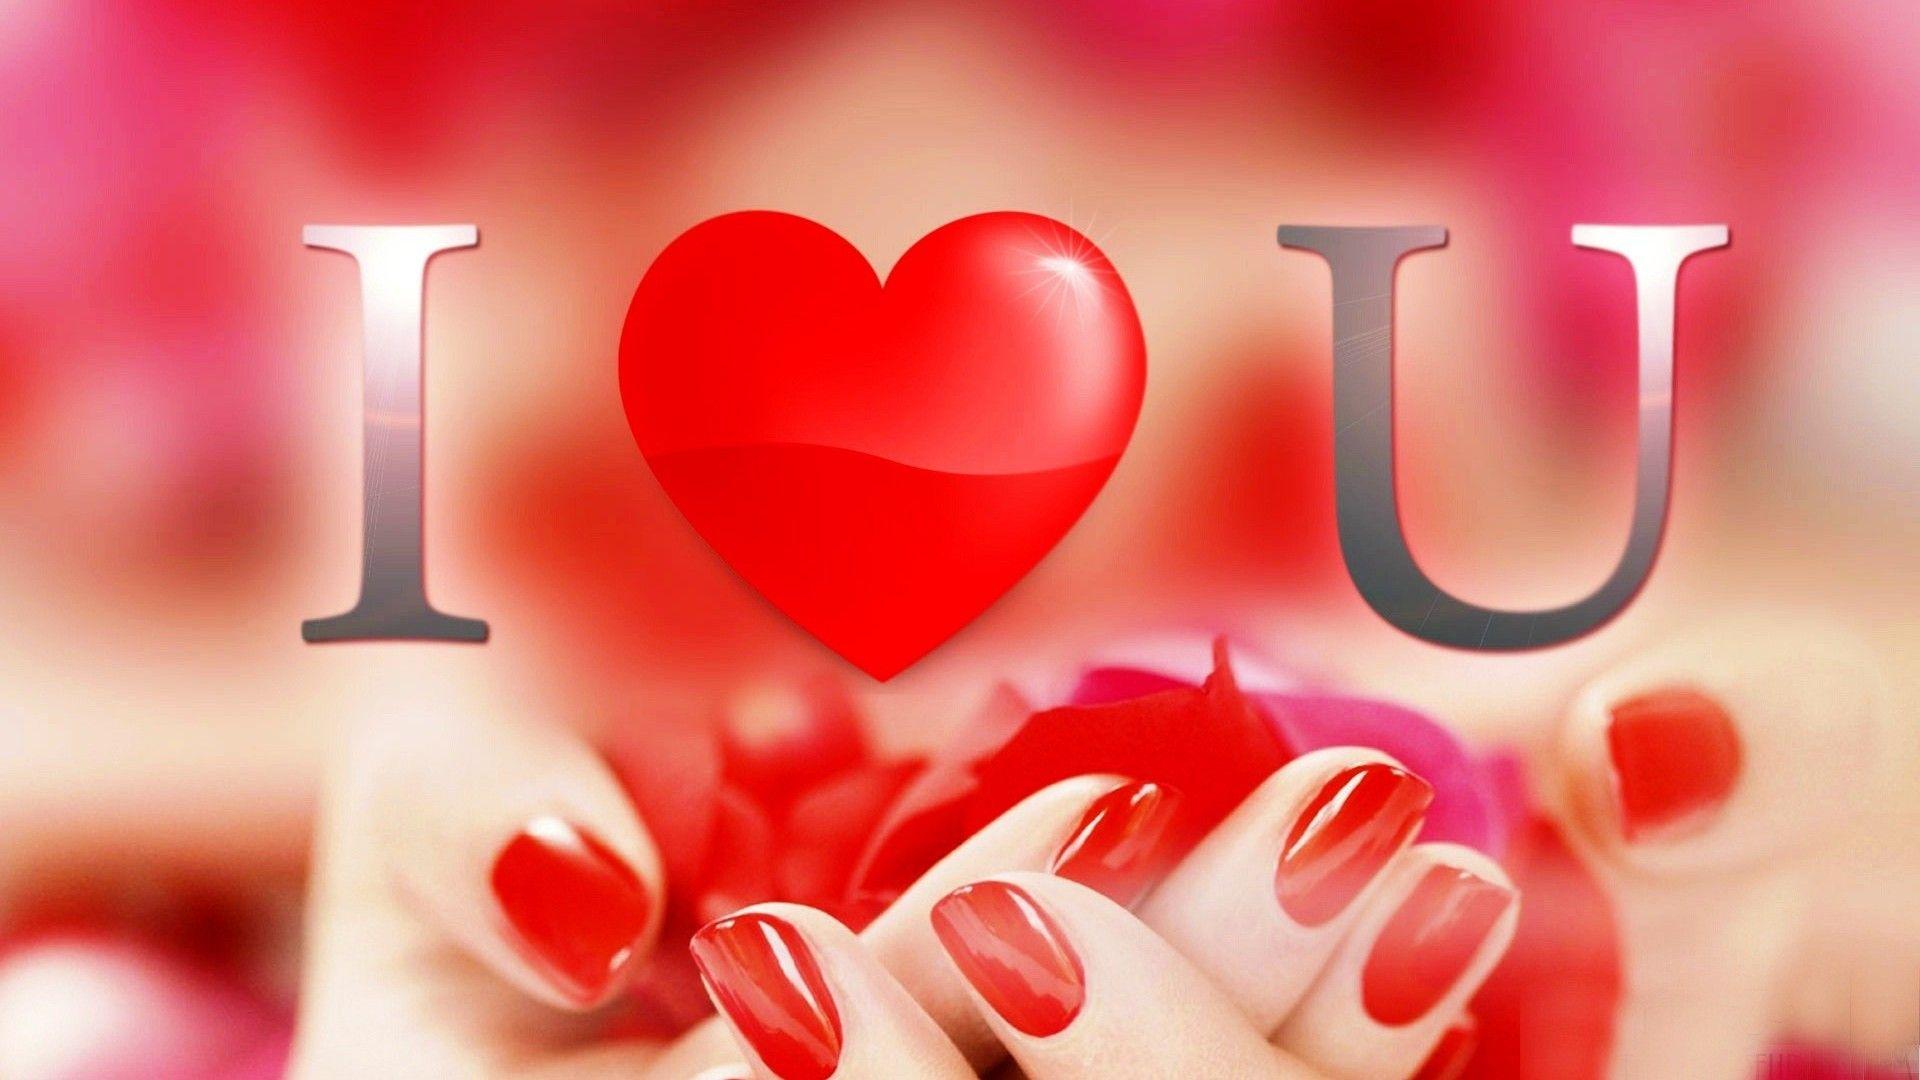 Love Desktop Wallpaper Best Wallpaper Hd Love You Images I